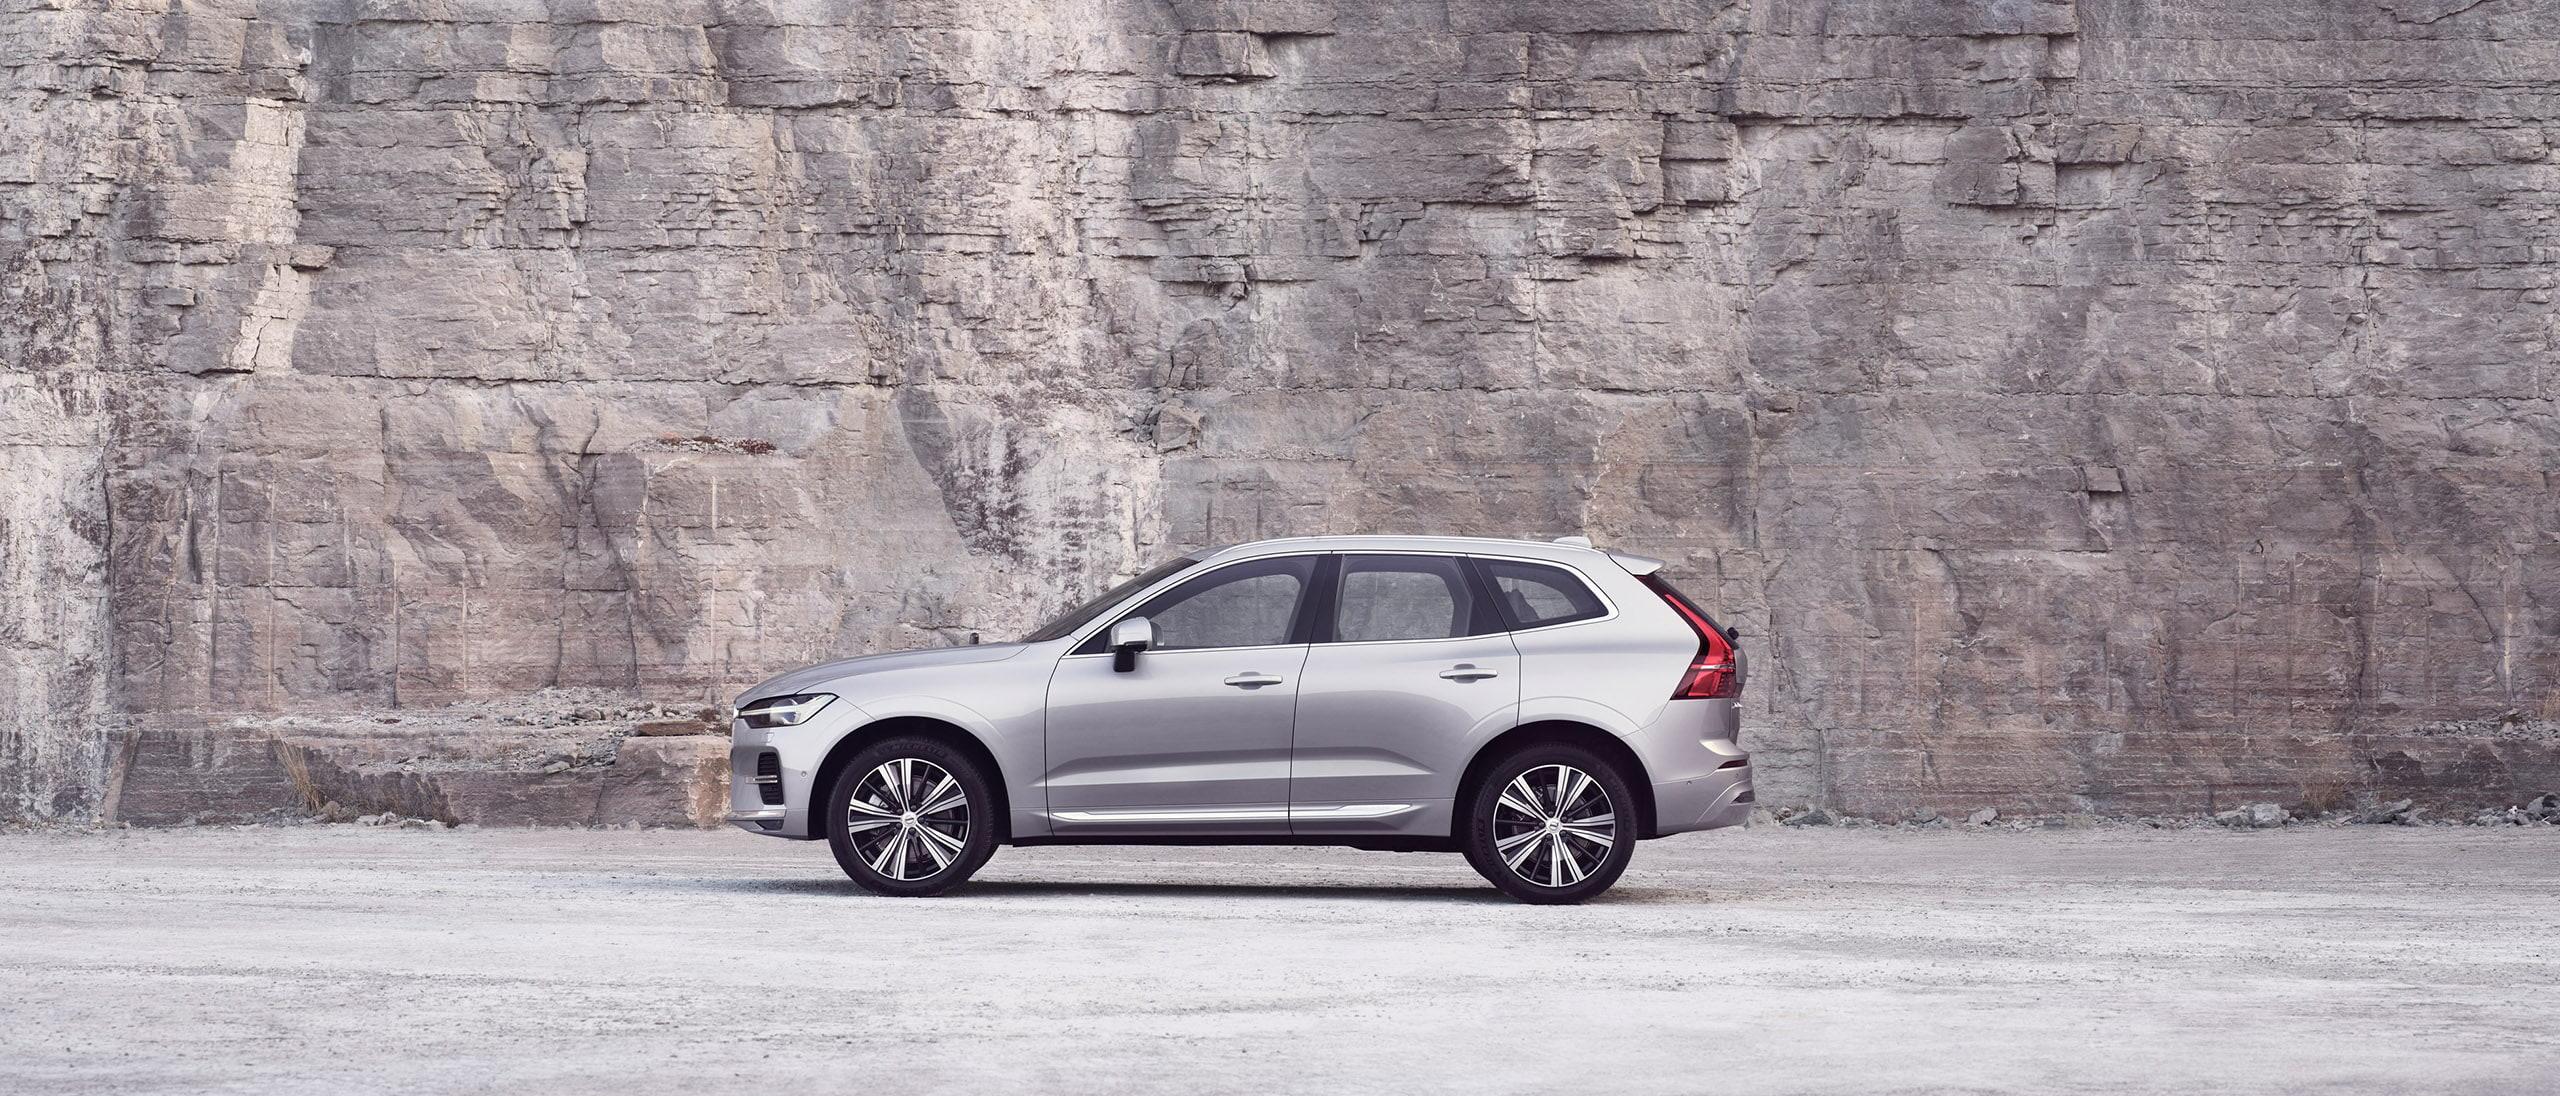 Сребрен Volvo XC60 стои неподвижно пред карпест ѕид.